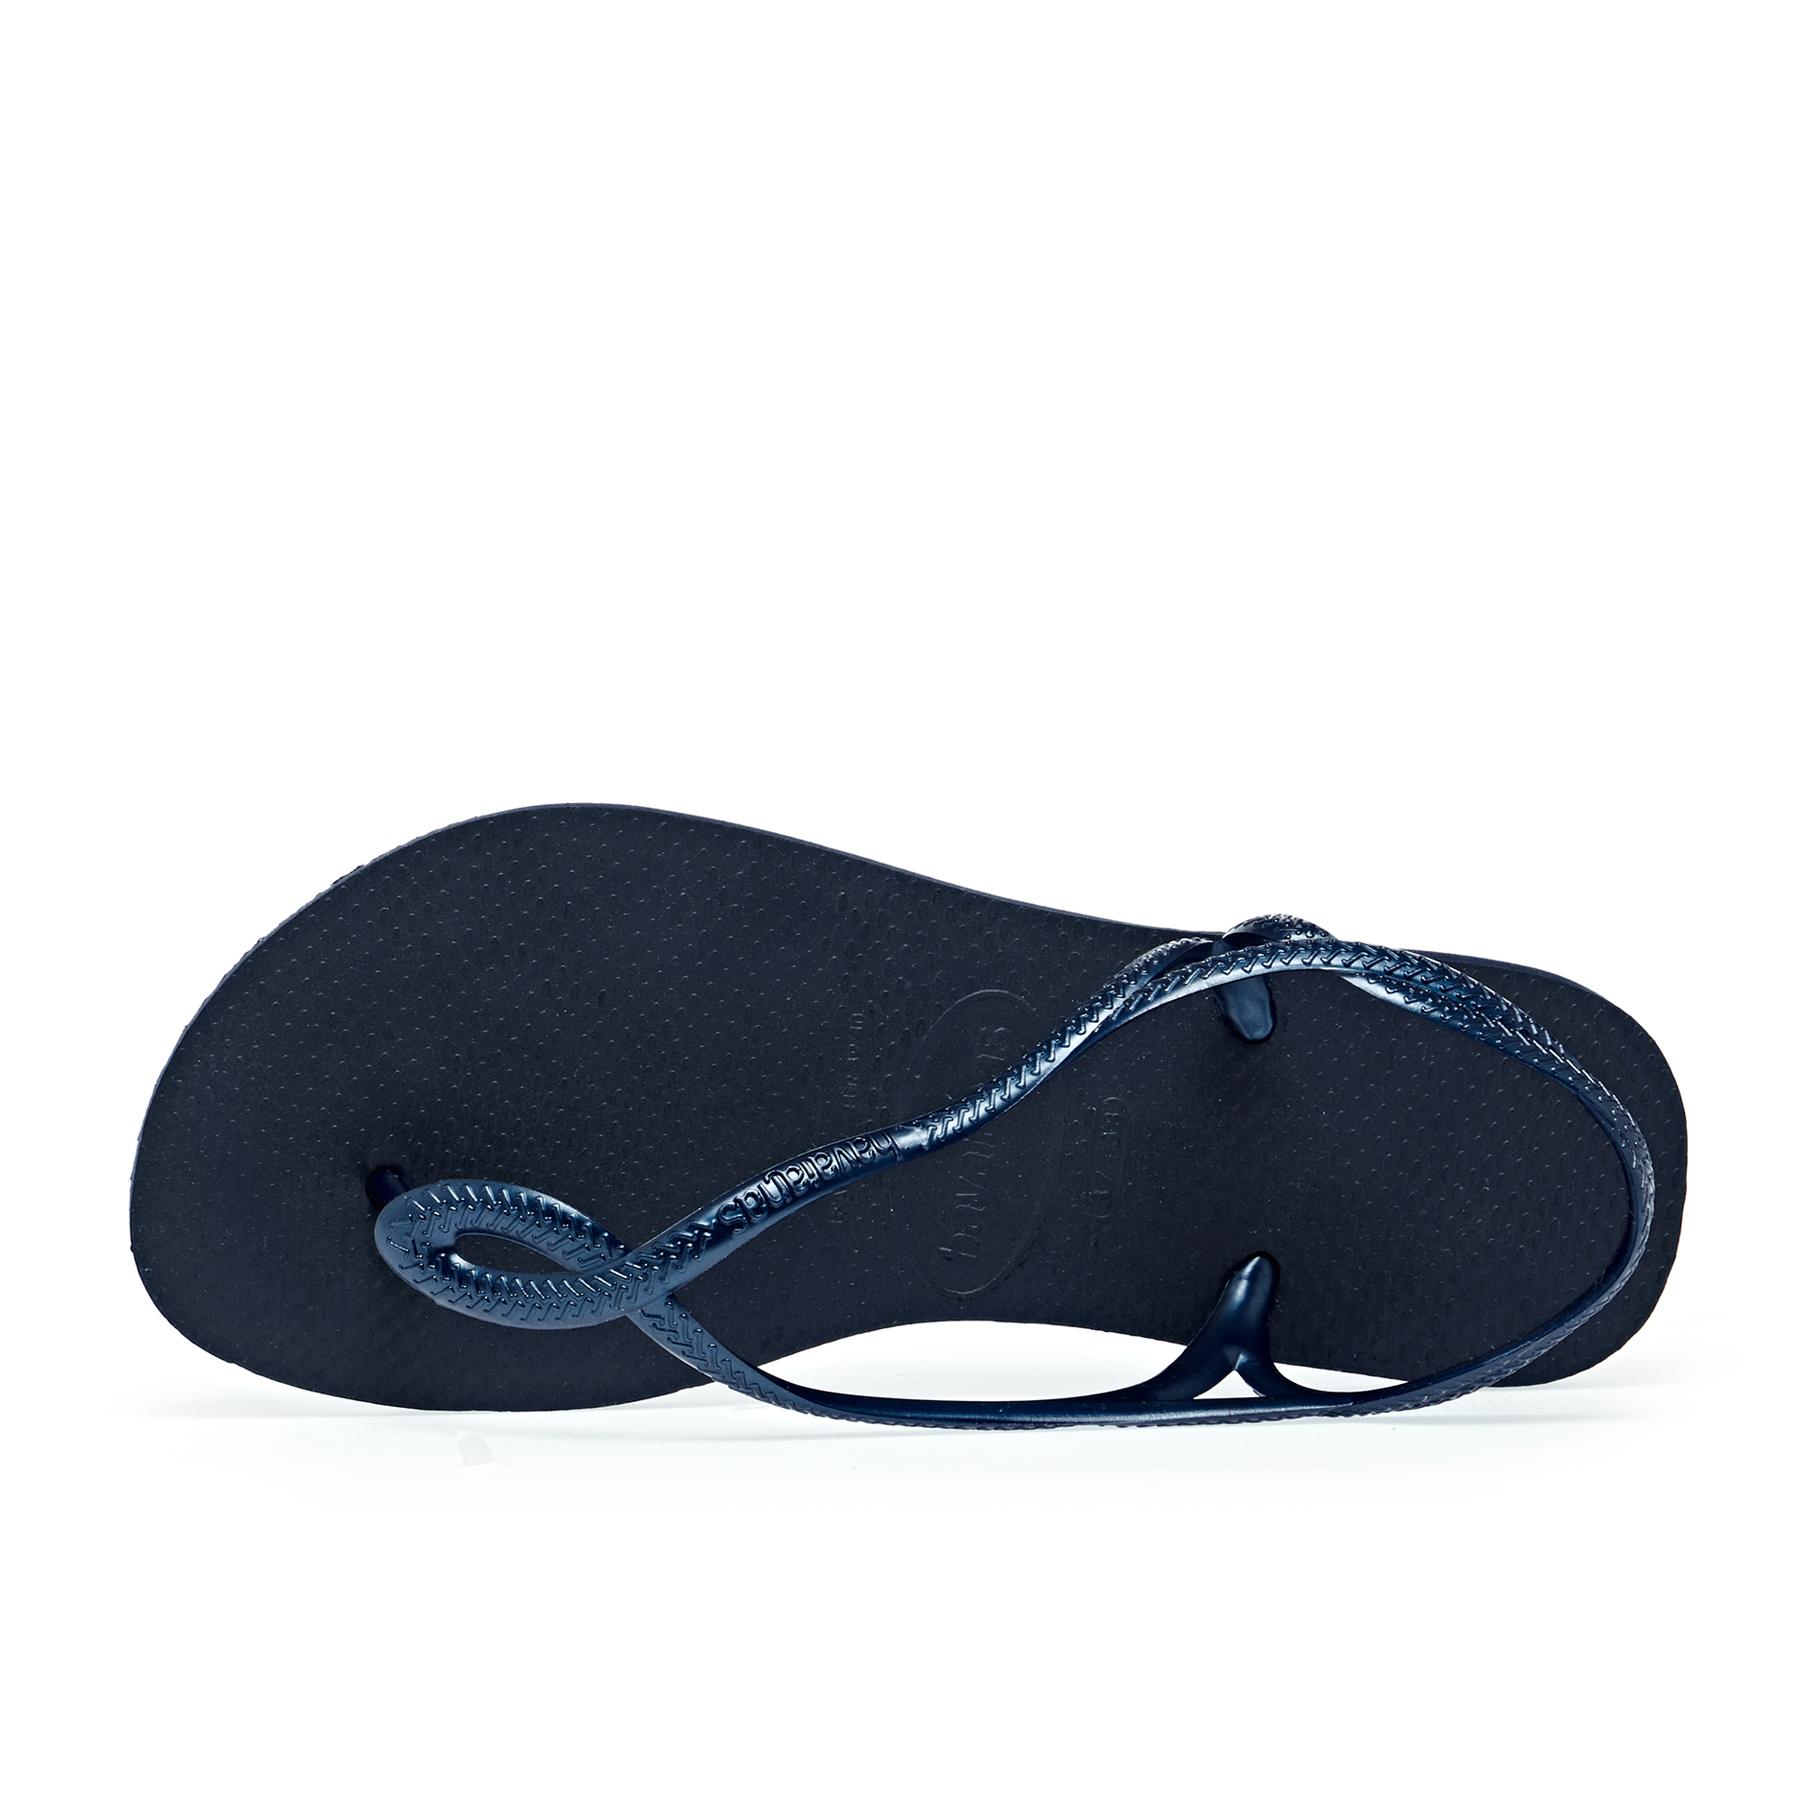 Havaianas Men`s Brazilian Flip Flops Surf Sandals Beige Navy Blue Sandal NWT